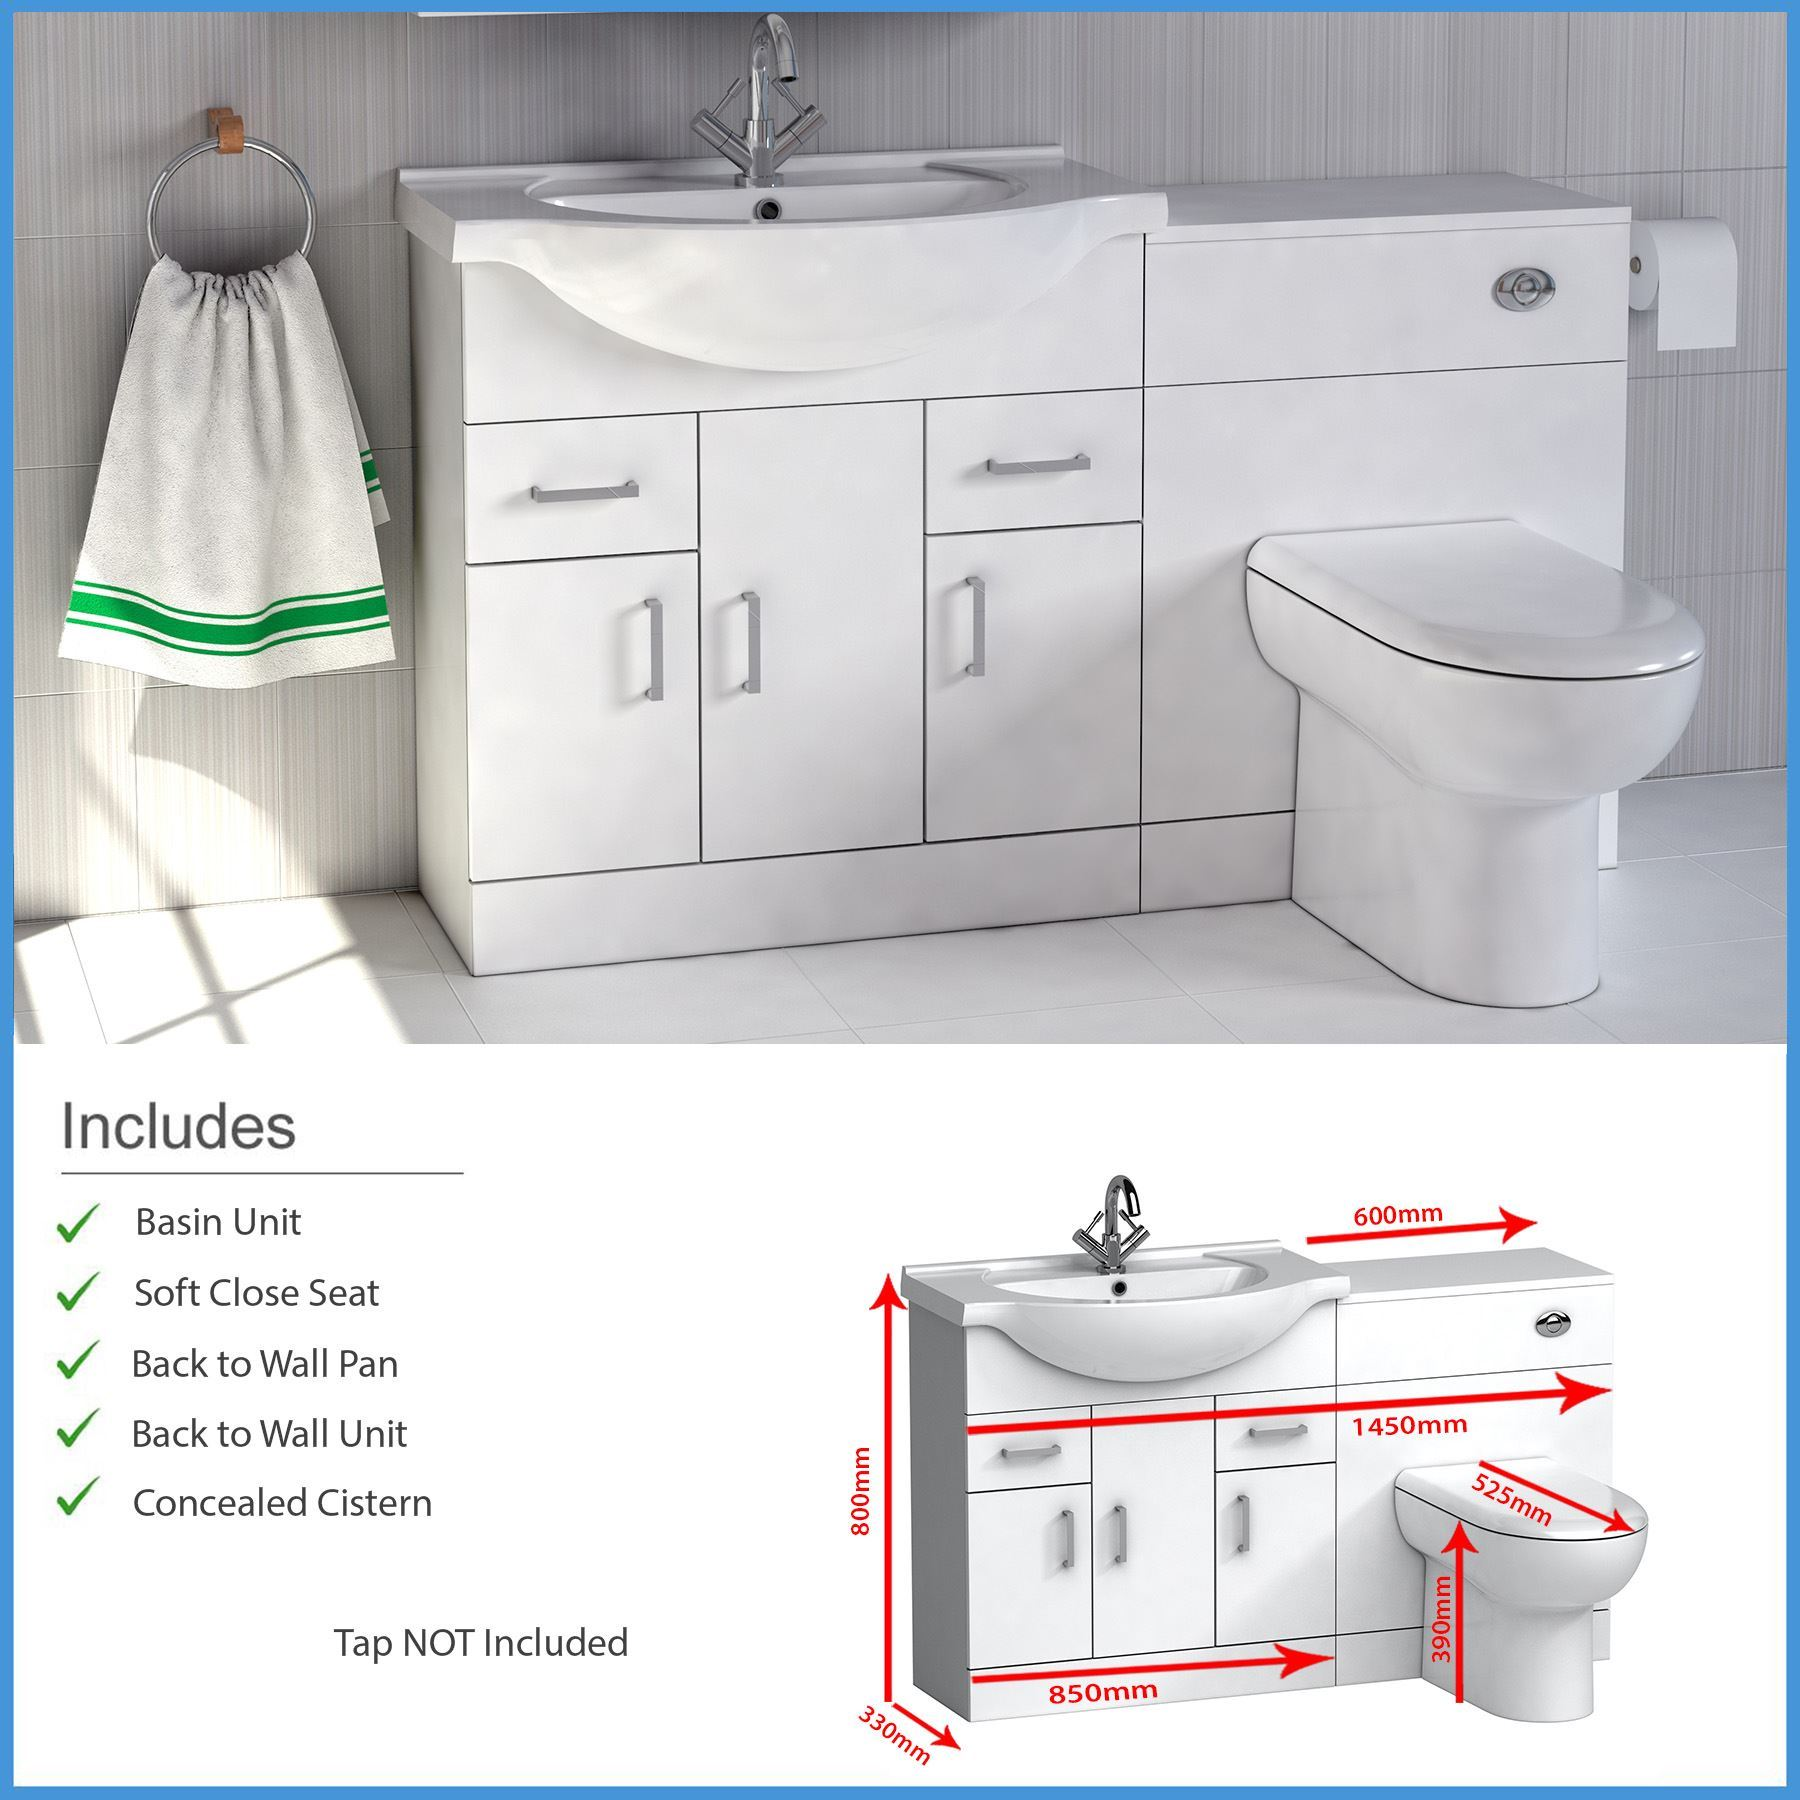 High gloss white bathroom furniture suite vanity unit - White gloss bathroom vanity unit ...